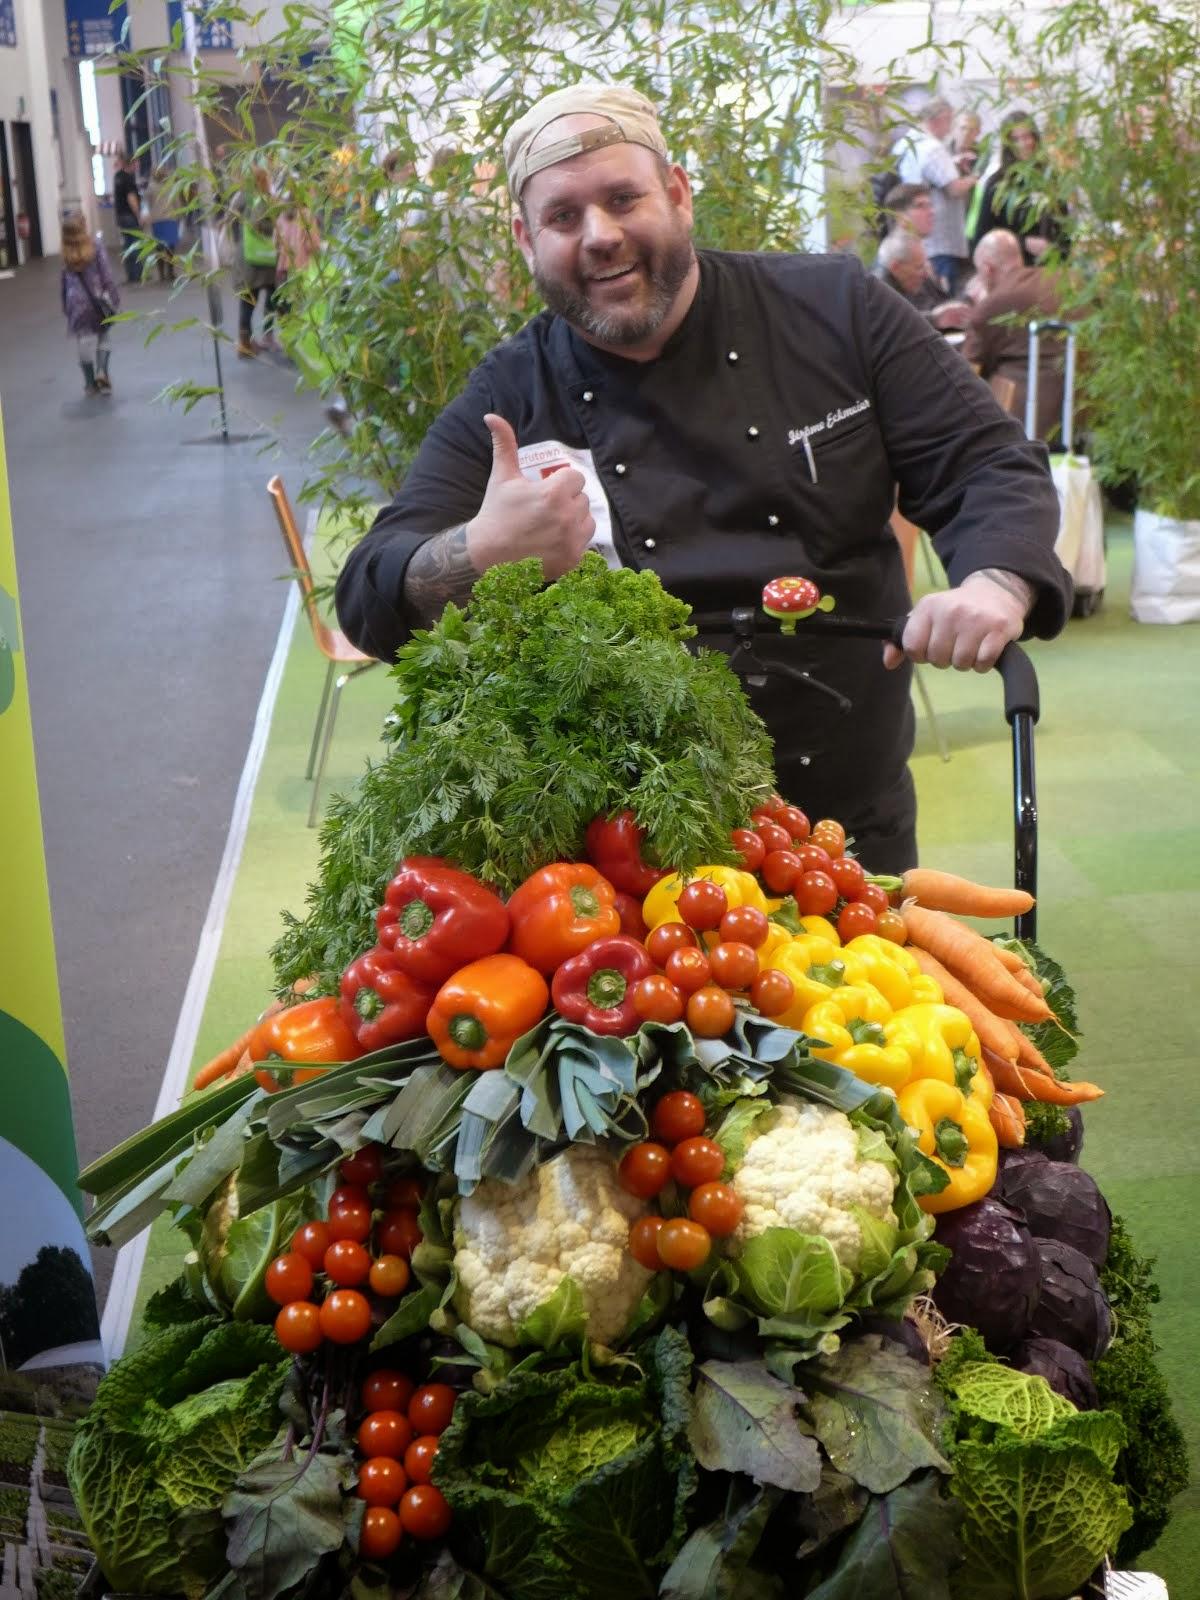 Veganer Profi Koch & staatlich geprüfter Lebensmitteltechniker